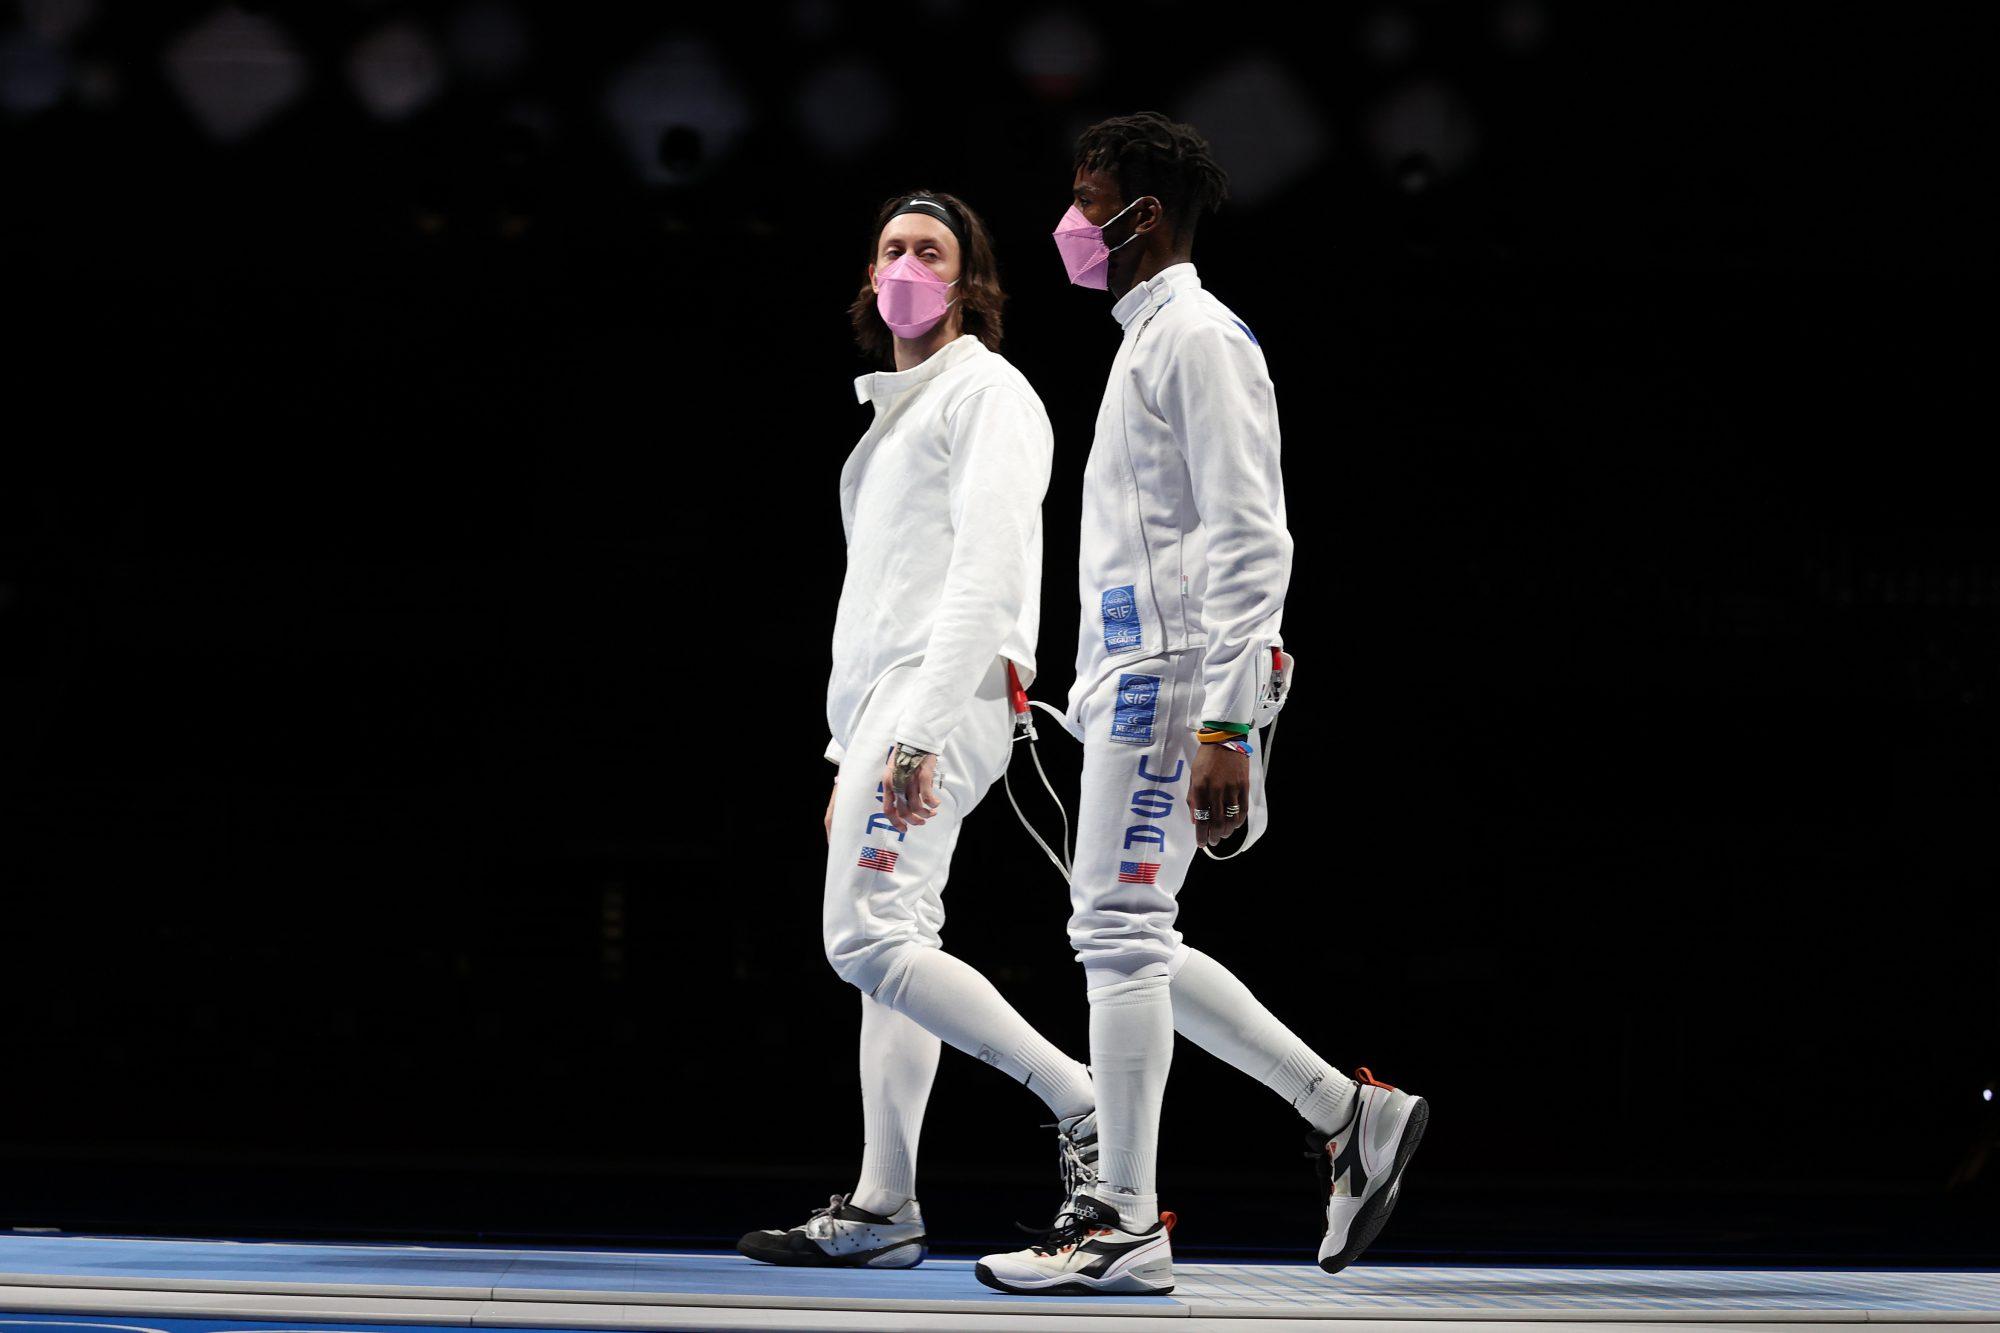 U.S. men's fencing team